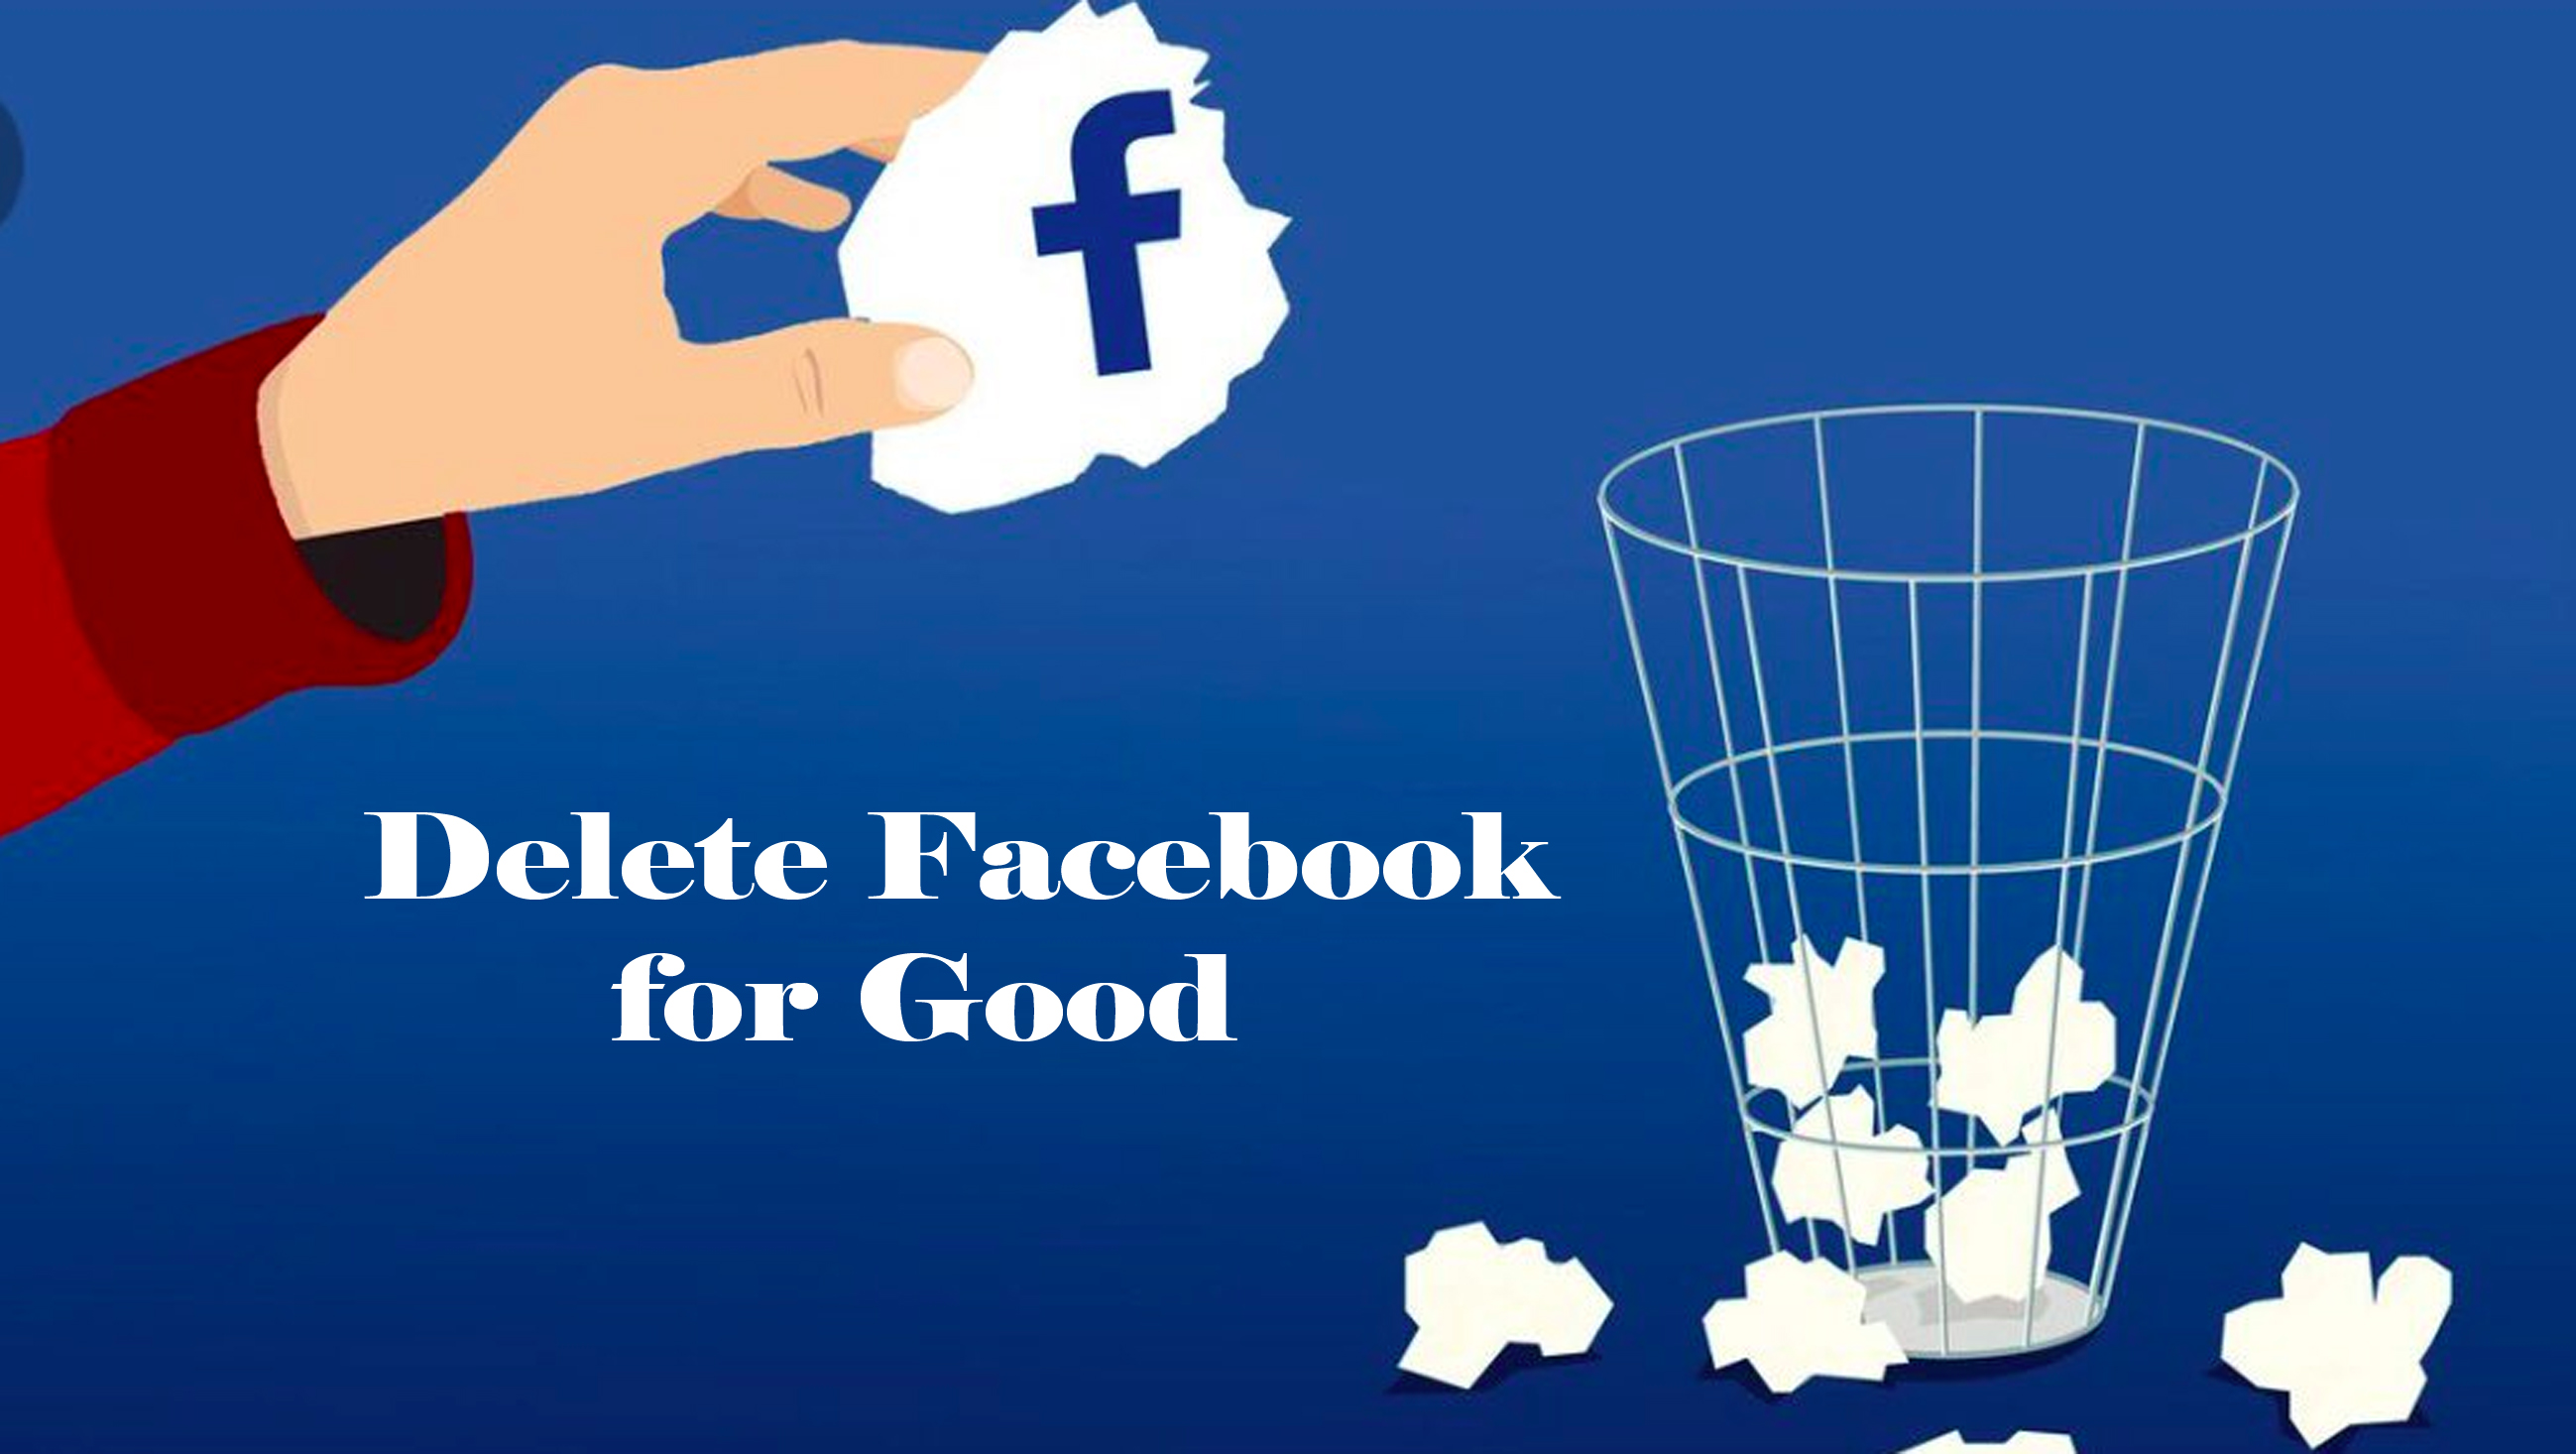 Delete Facebook for Good - Permanently Delete Facebook